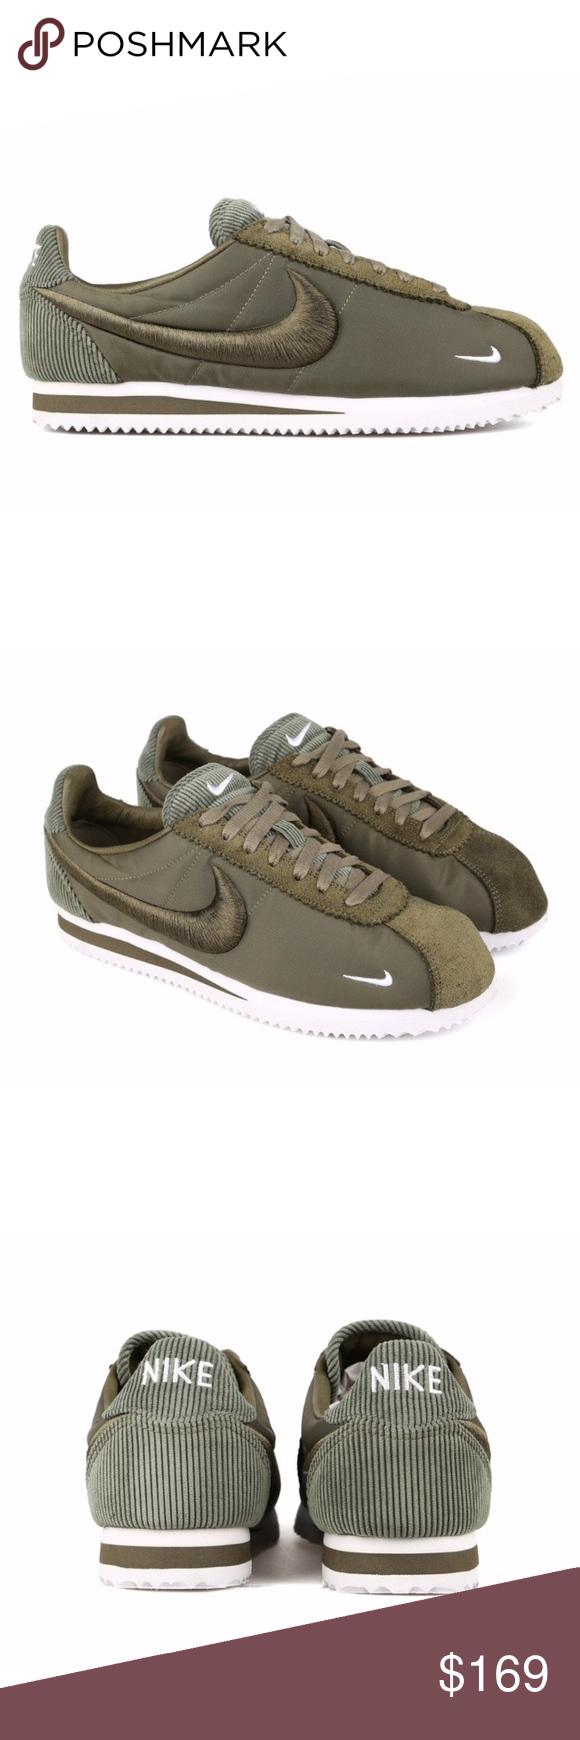 Nike classic cortez sp olive green womens size 8 nwt Nike classic